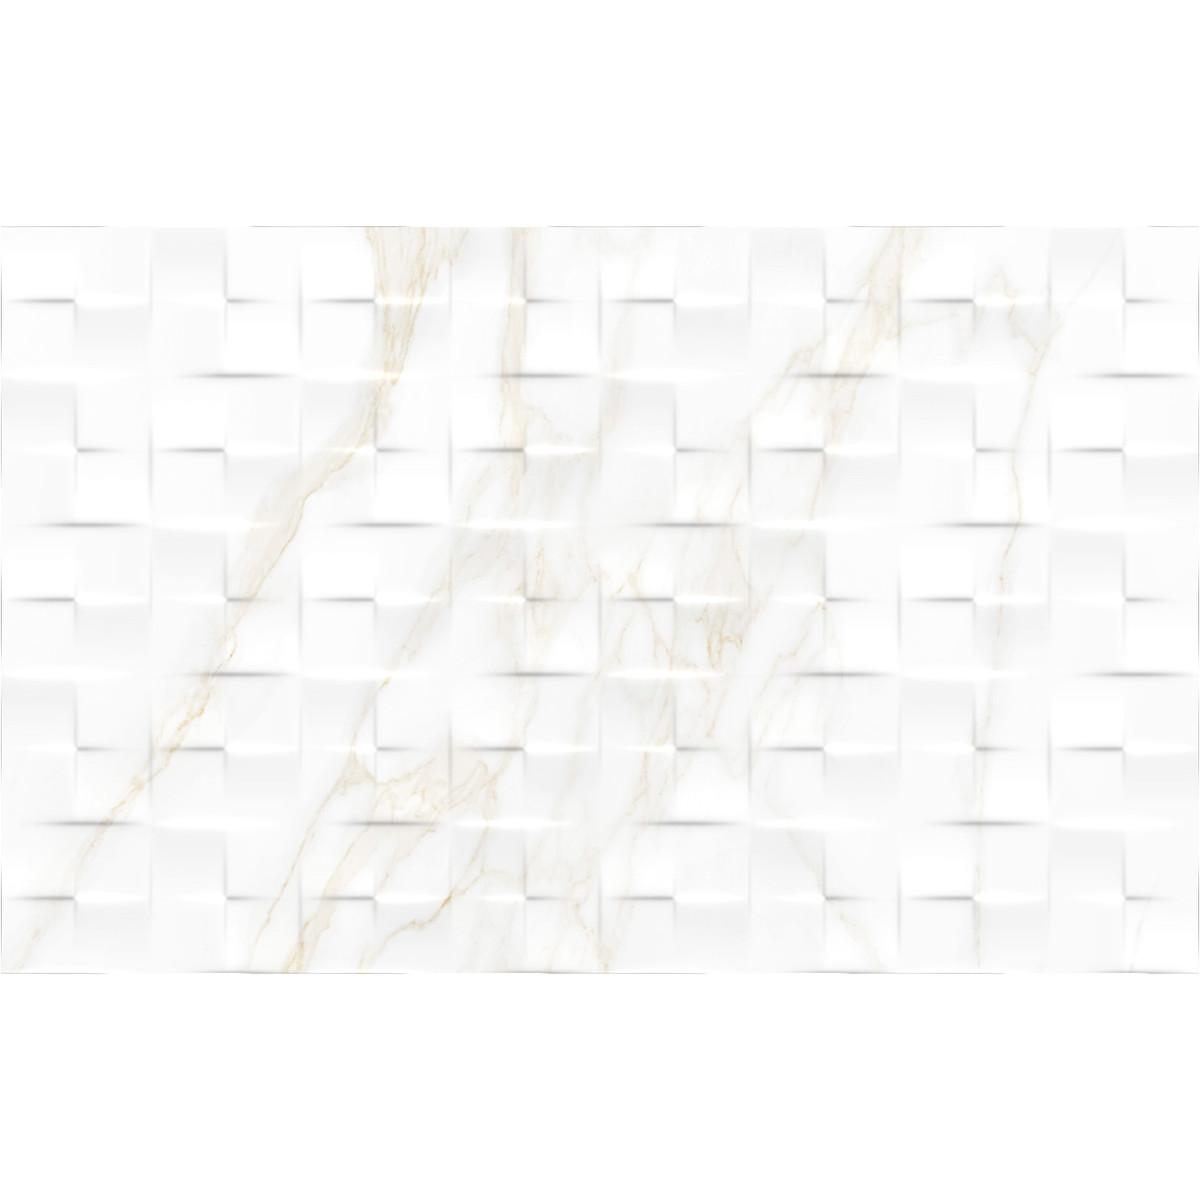 Плитка настенная Alessandro рельефная 25х40 см 1.6 м² цвет бежевый